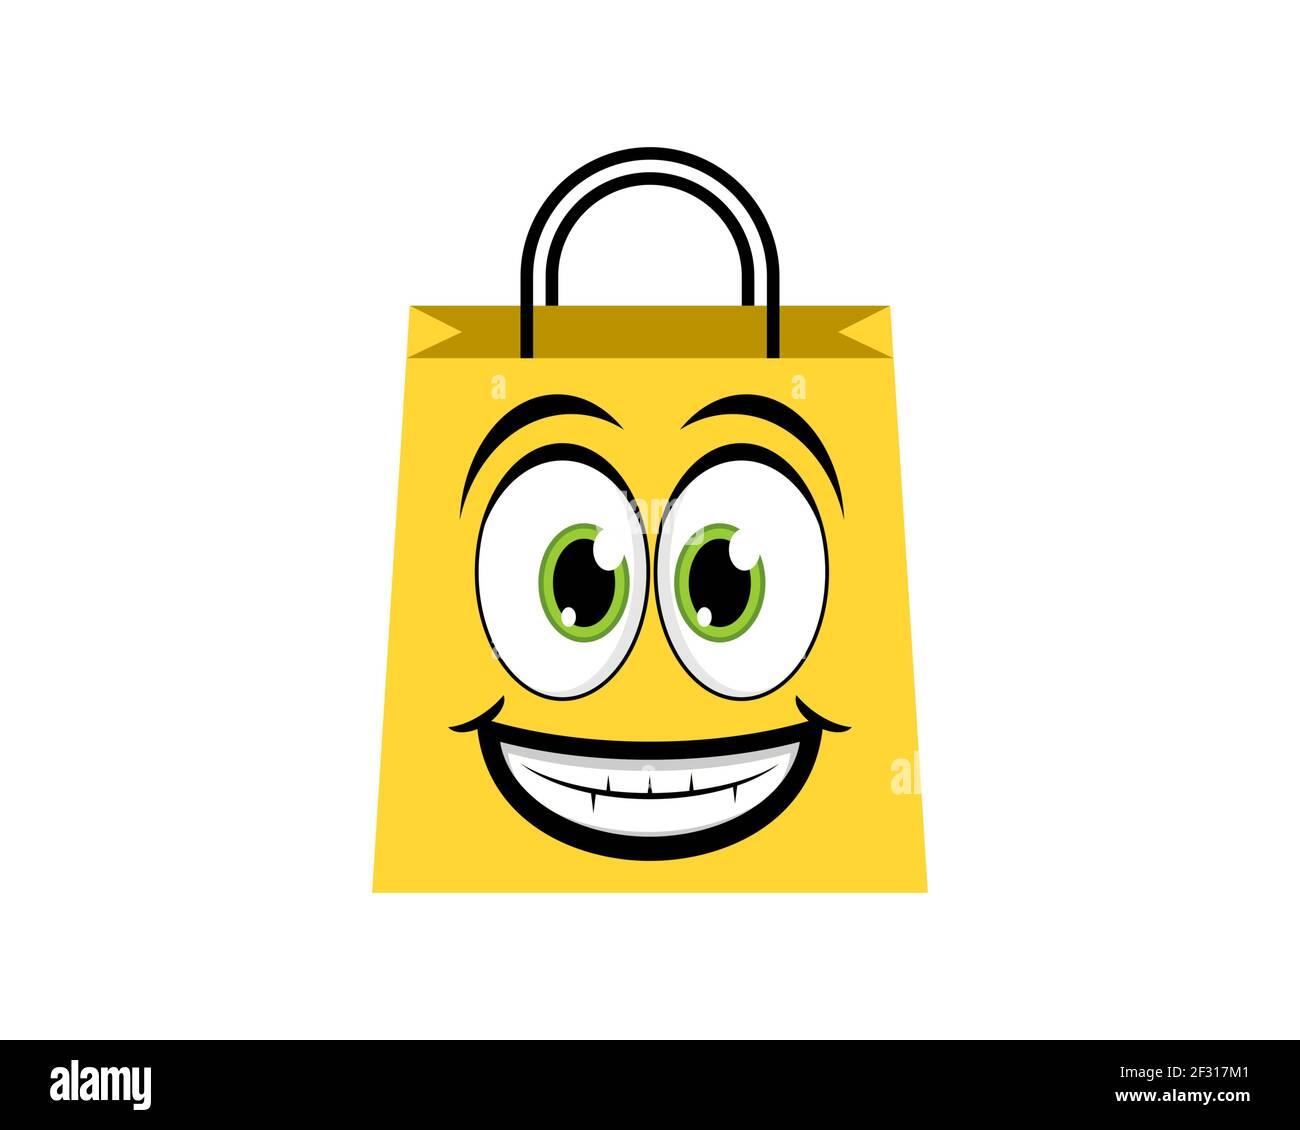 Bolsa de compras con cara de sonrisa Foto de stock